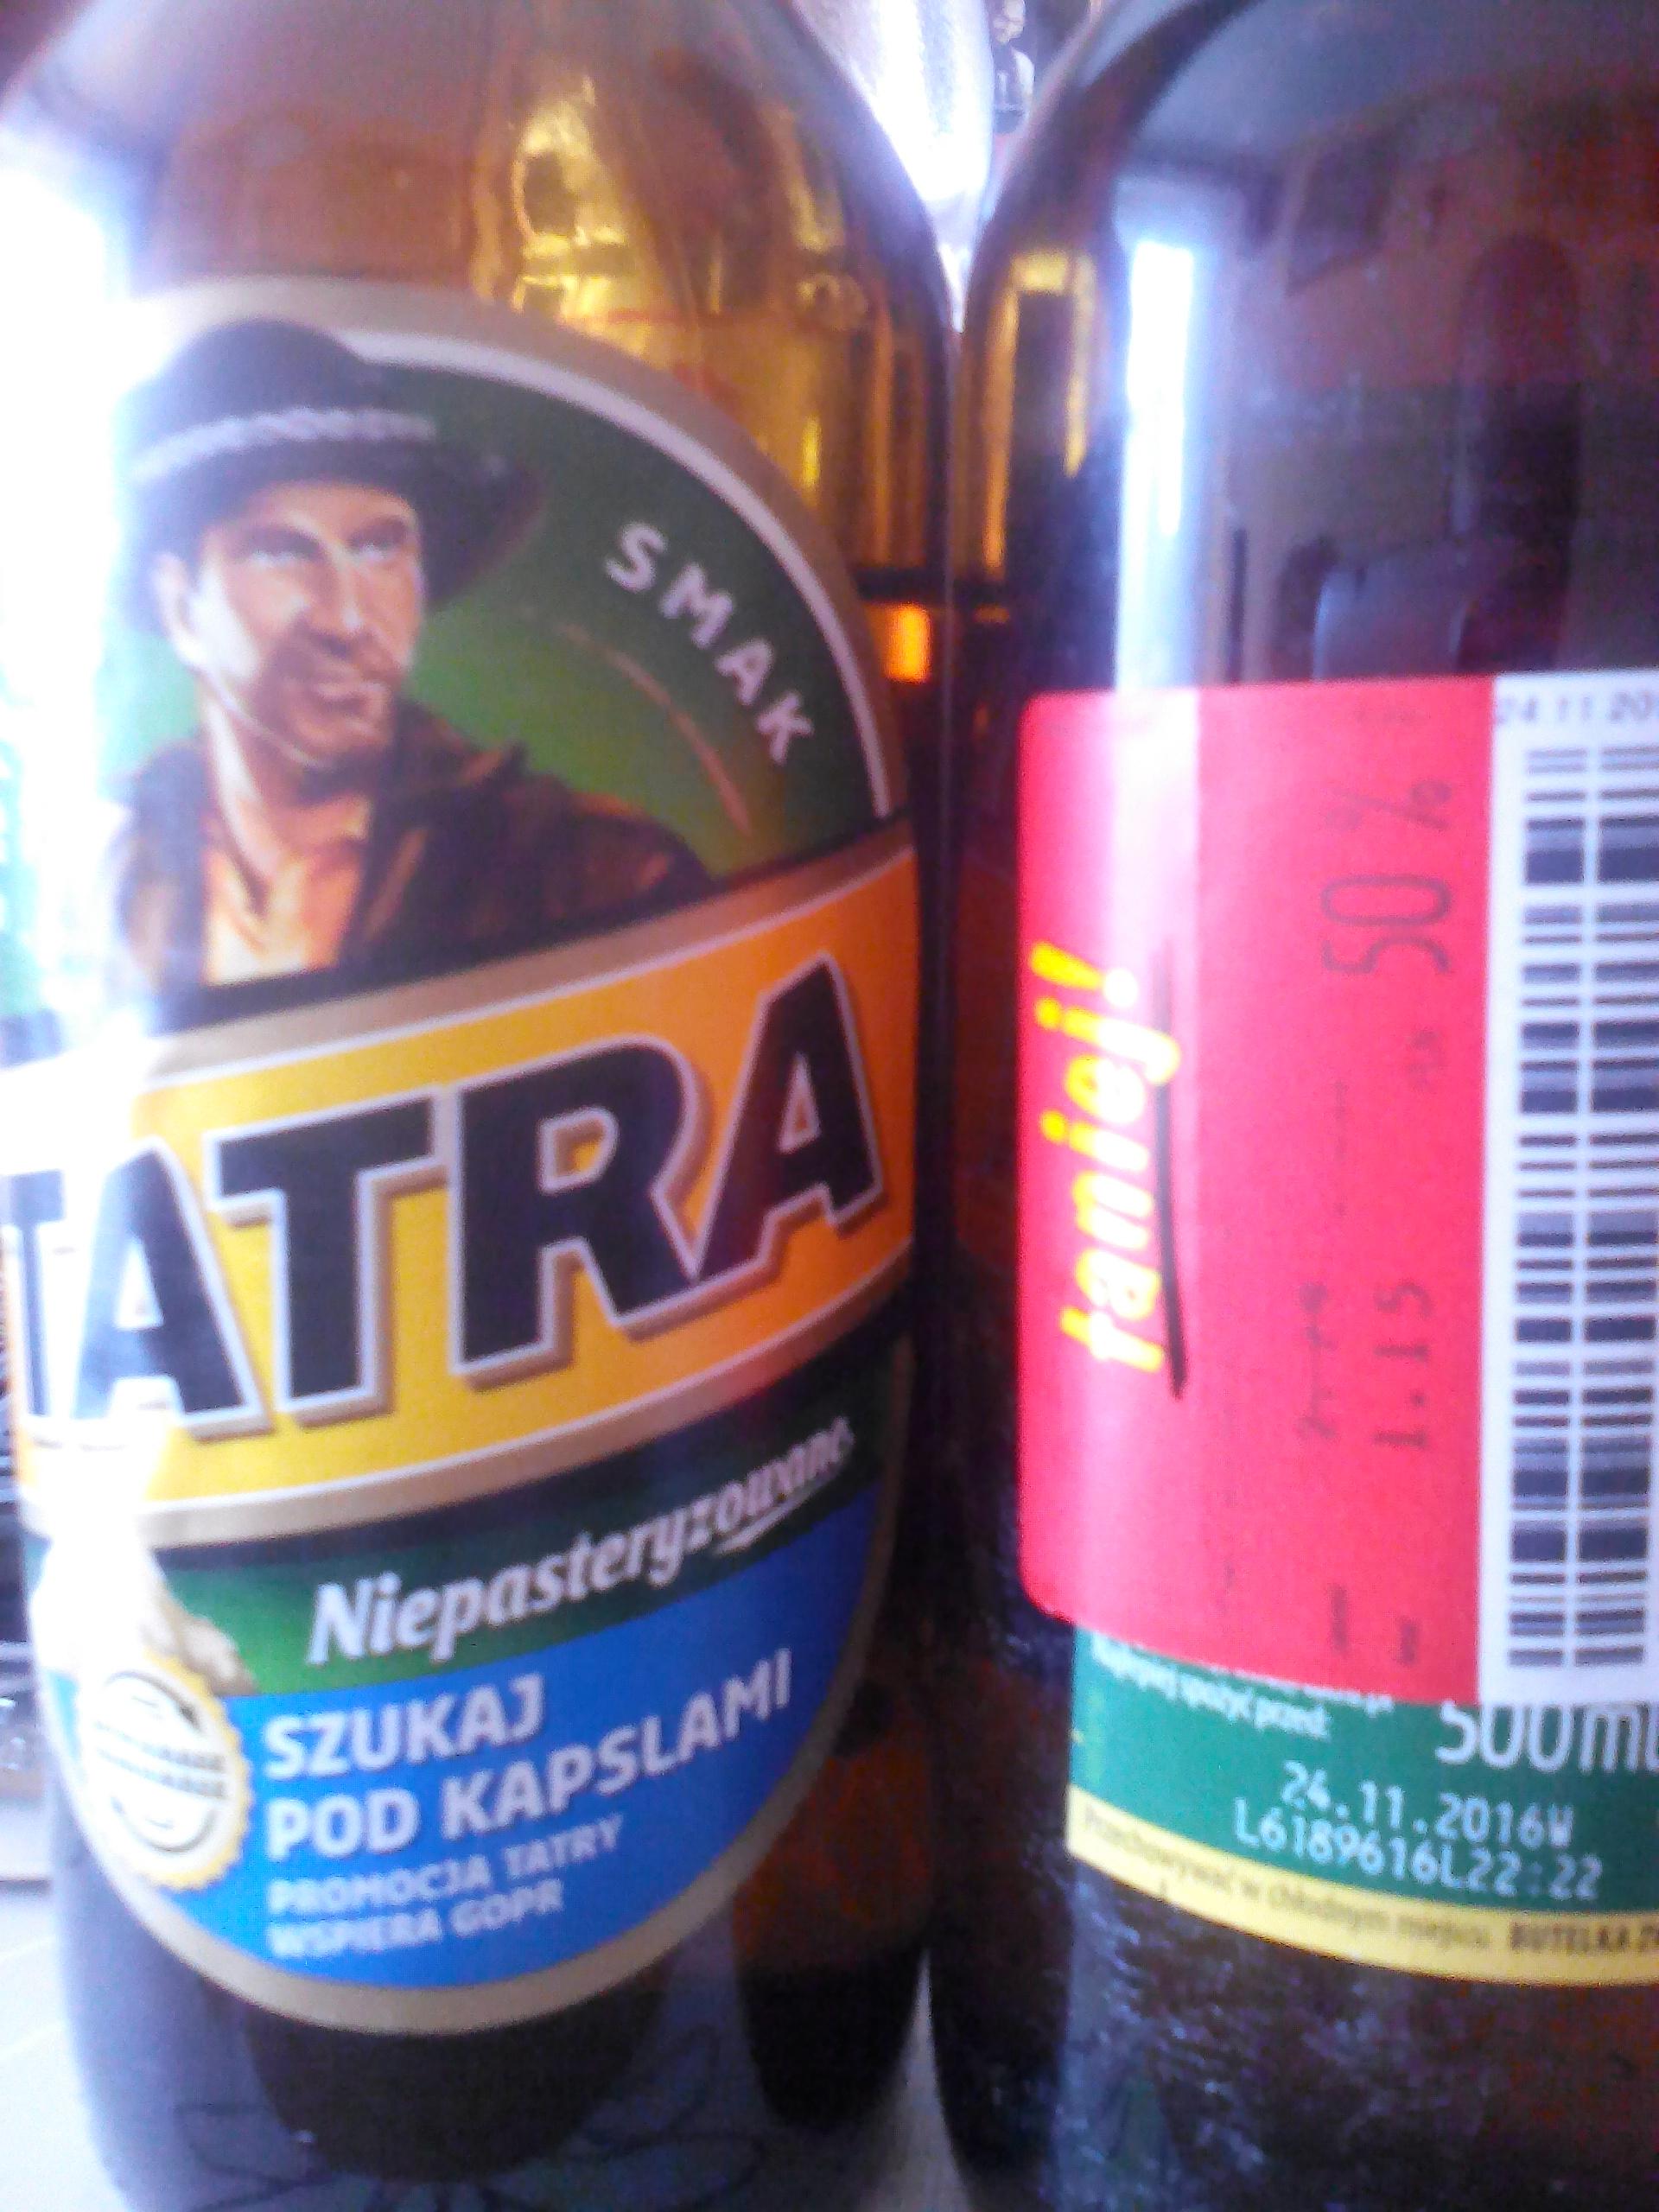 PIWO Tatra niepasteryzowane (Nysa)